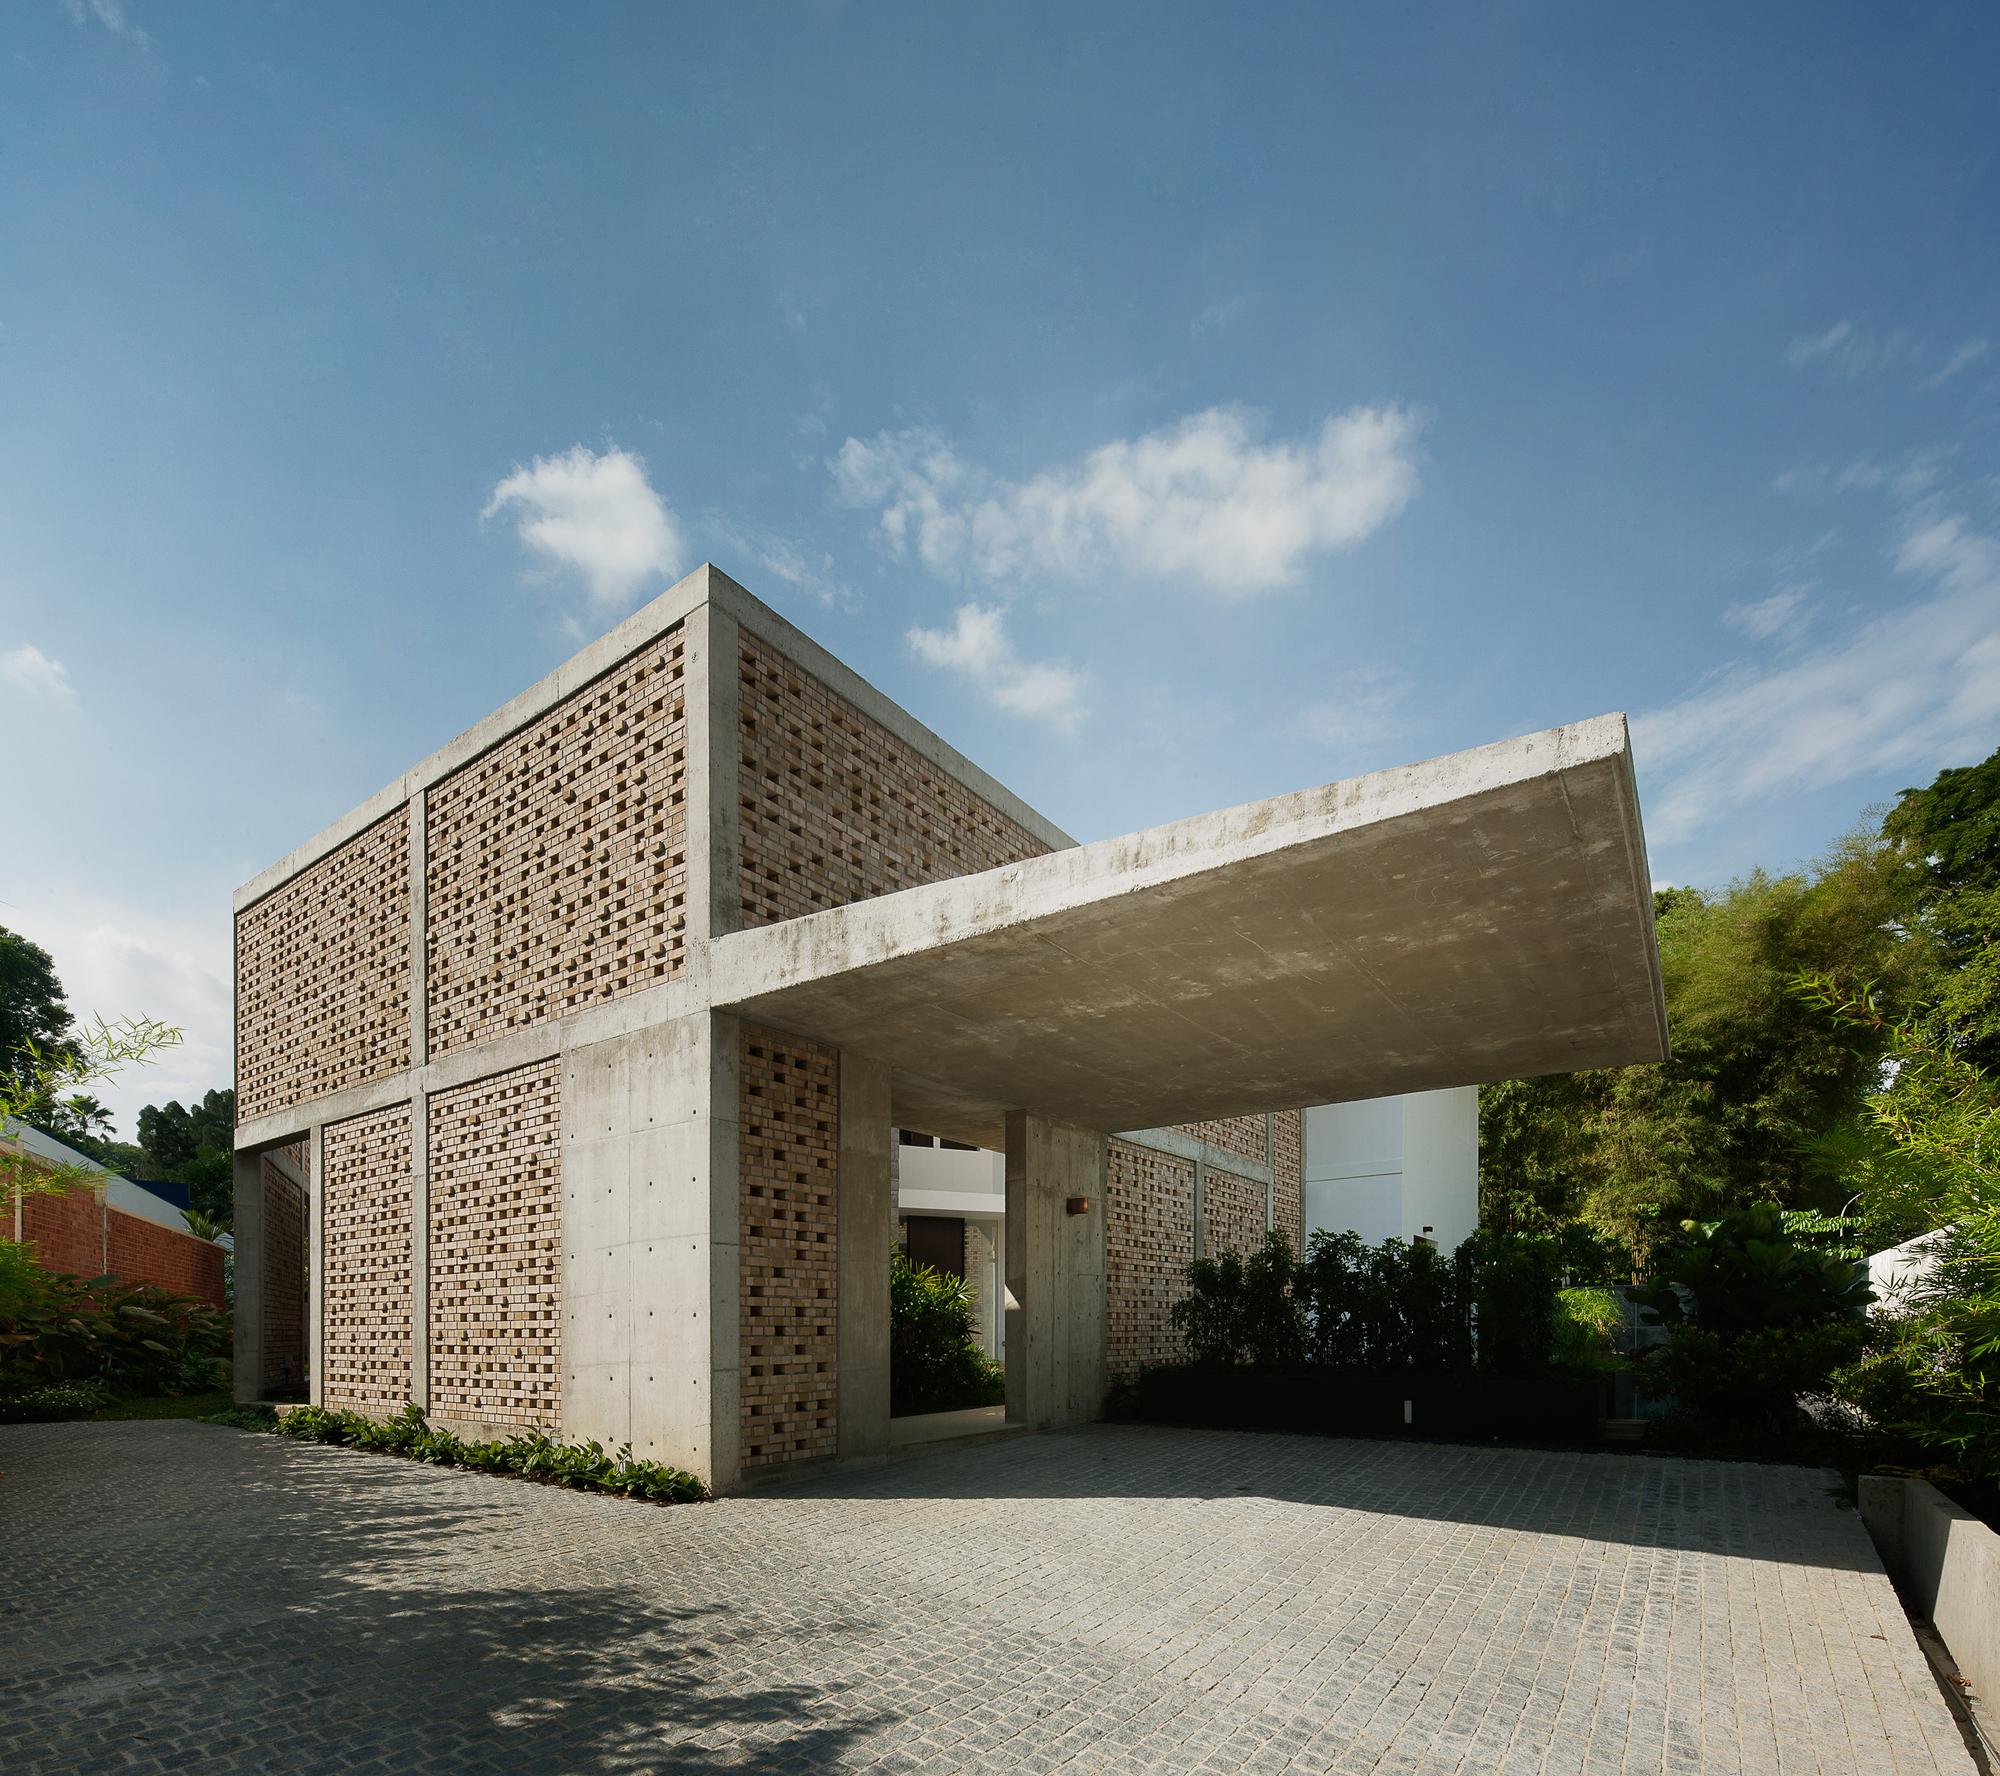 3 Lermit Road Ipli Architects Archdaily